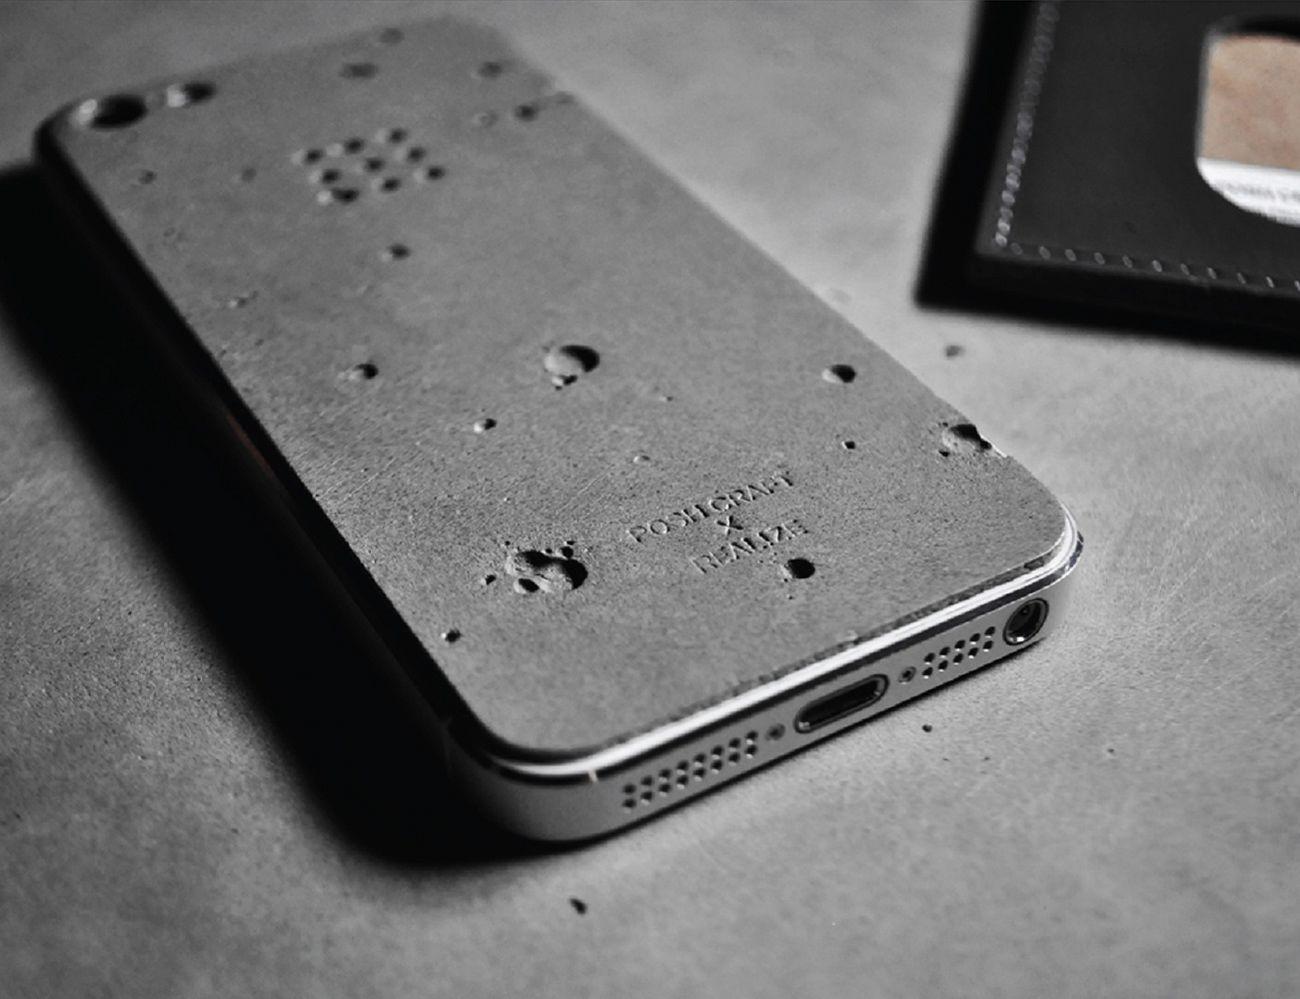 Luna Concrete iPhone SE/5s Skin